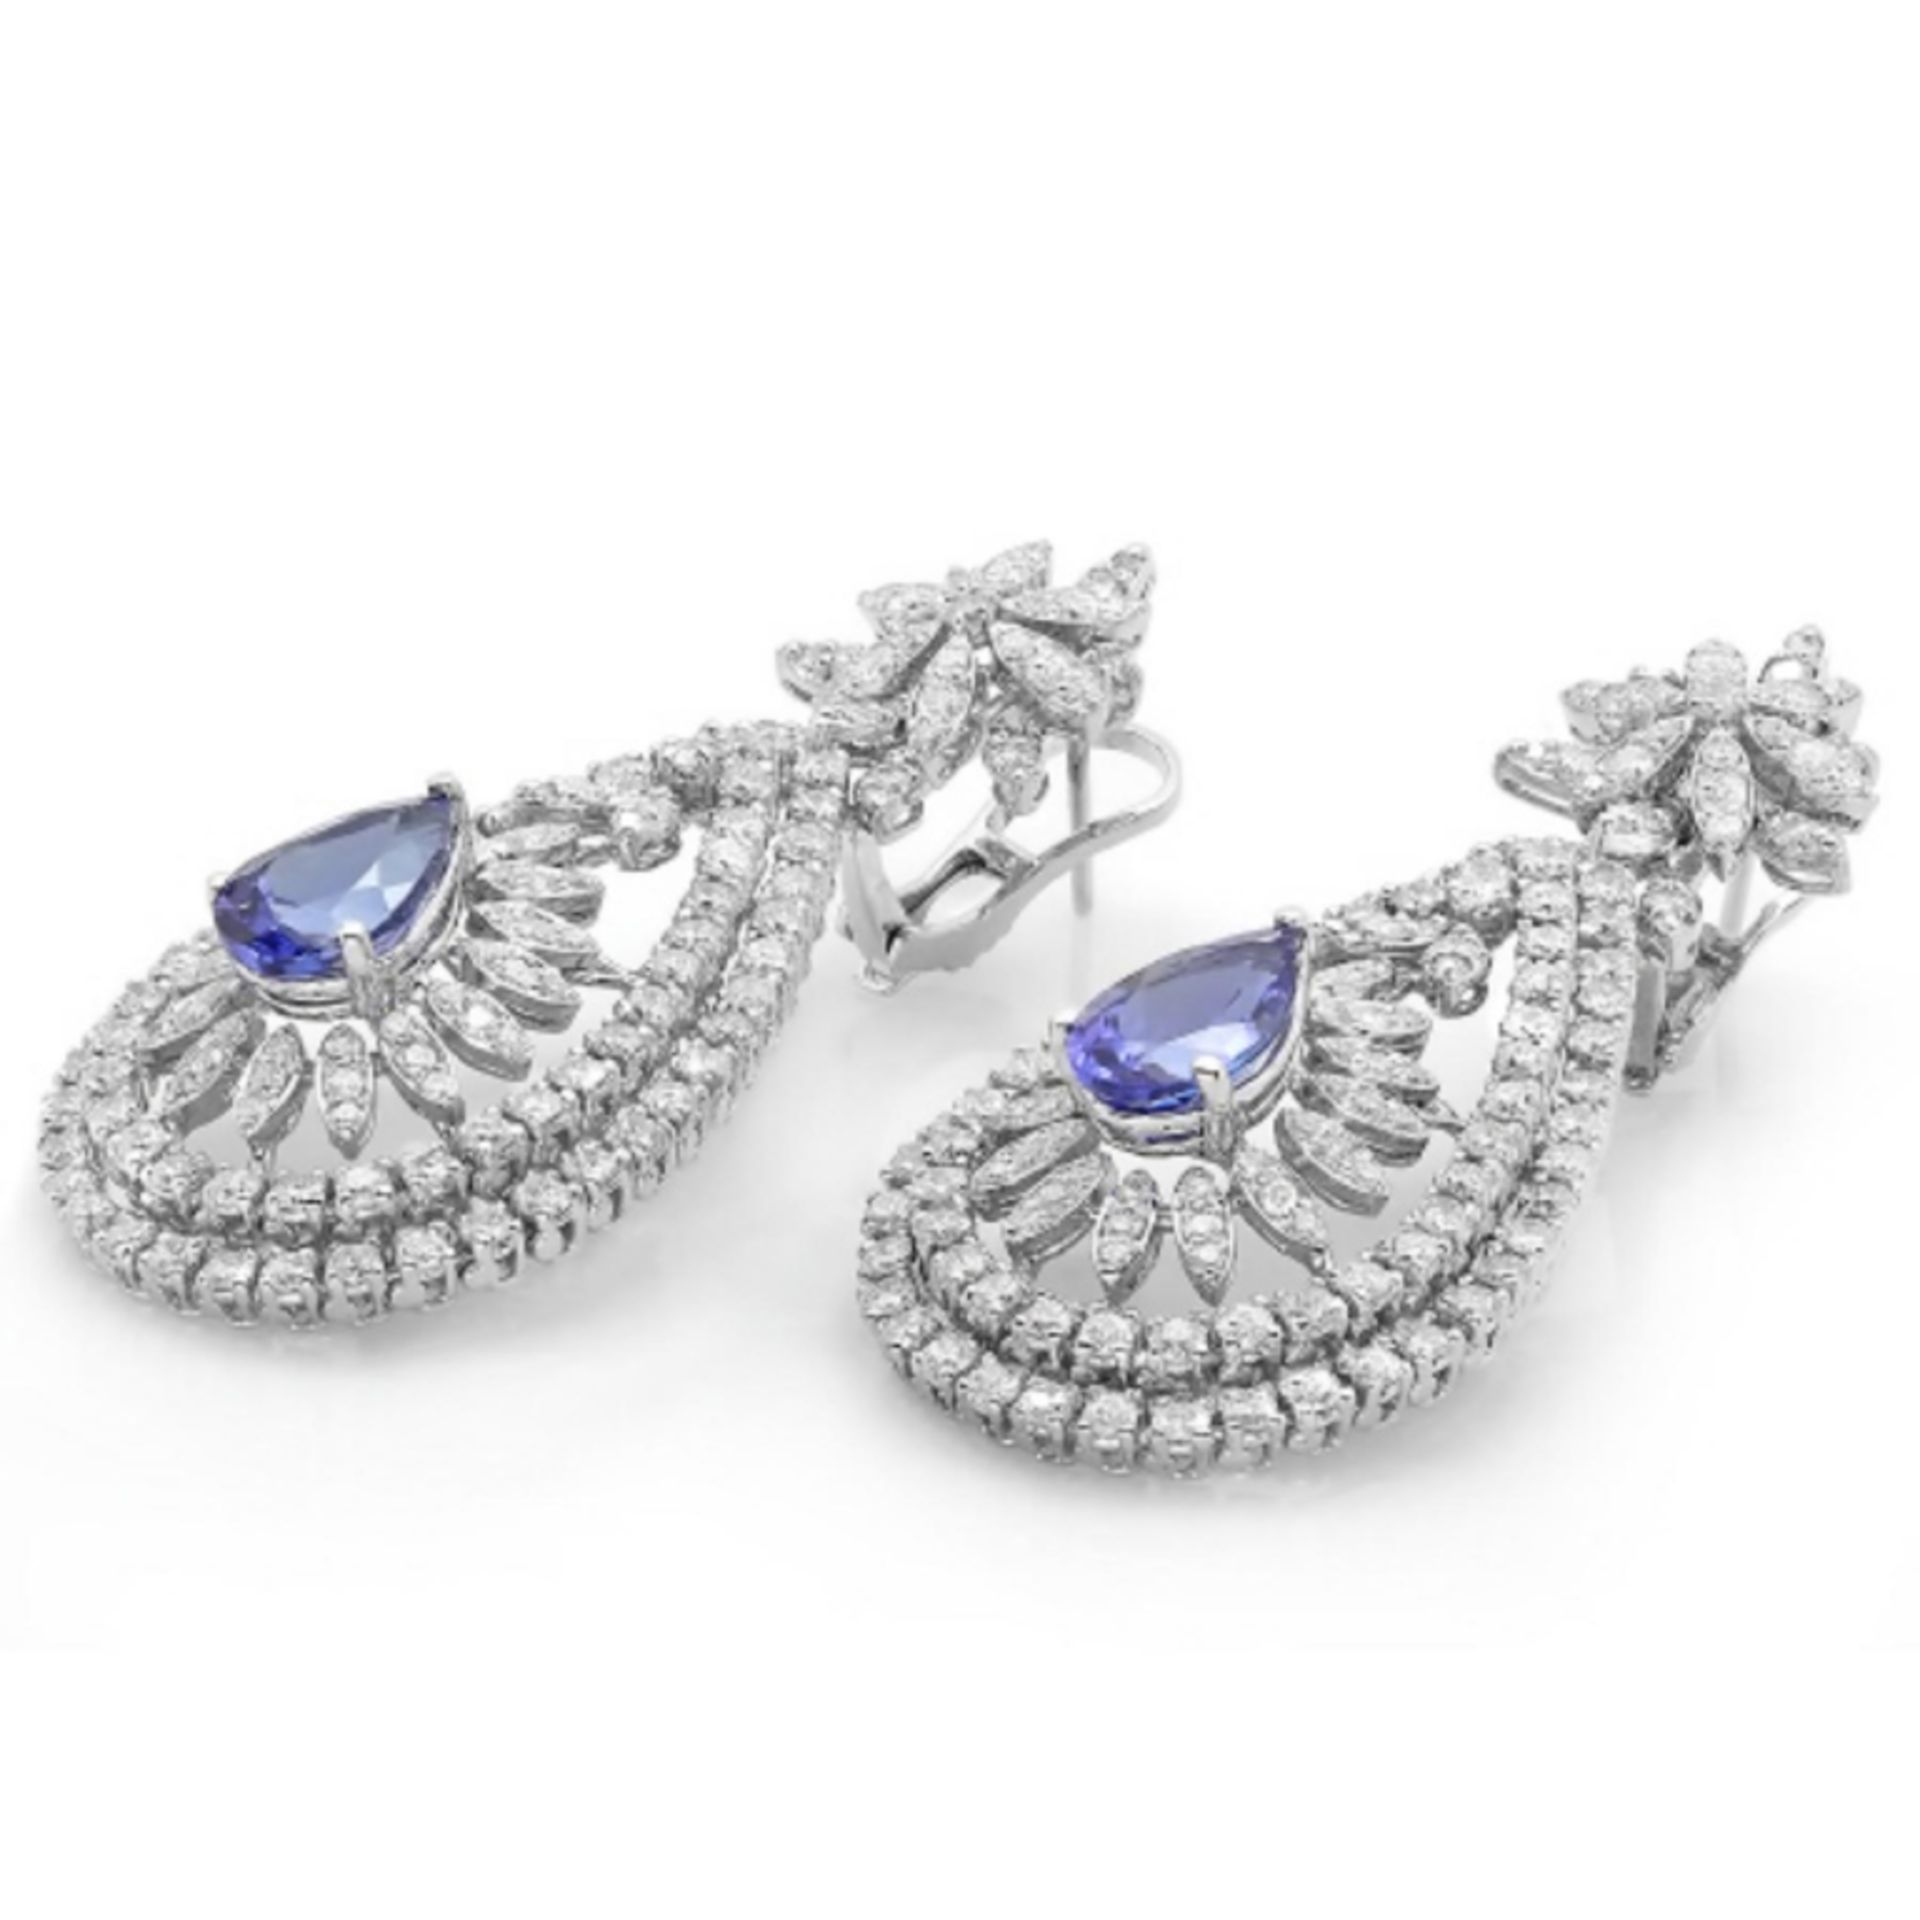 14K Gold 6.00ct Tanzanite & 7.20ct Diamond Earring - Image 2 of 2